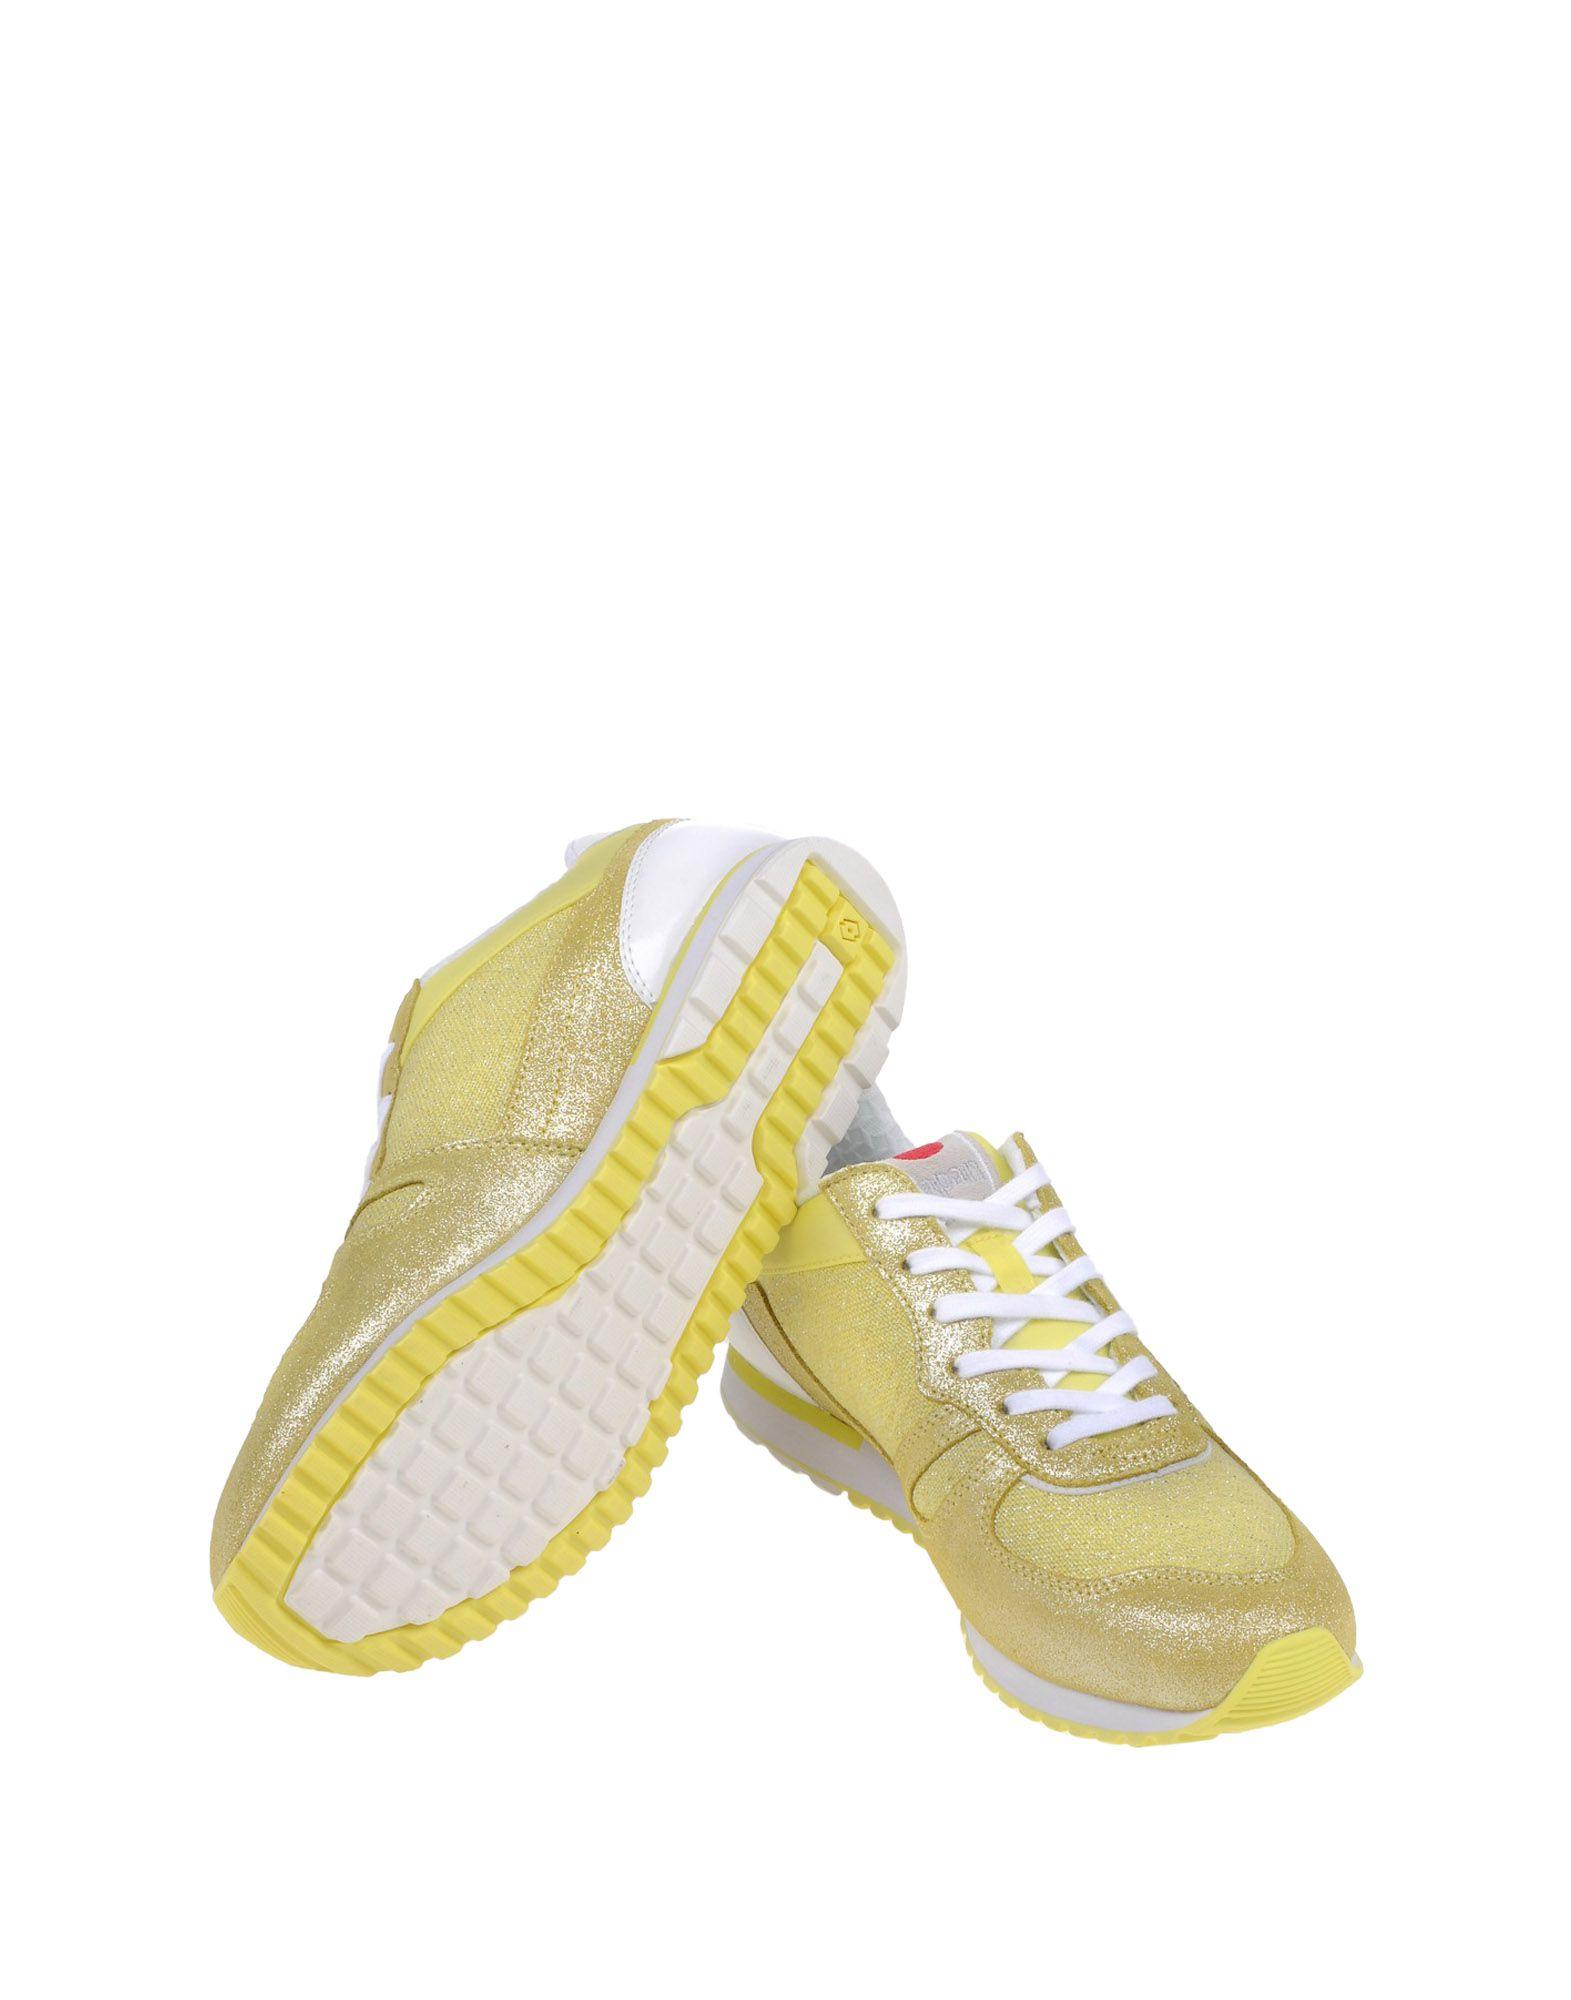 Sneakers Lotto Leggenda Tokyo Shibuya W - Donna - 11006417LB